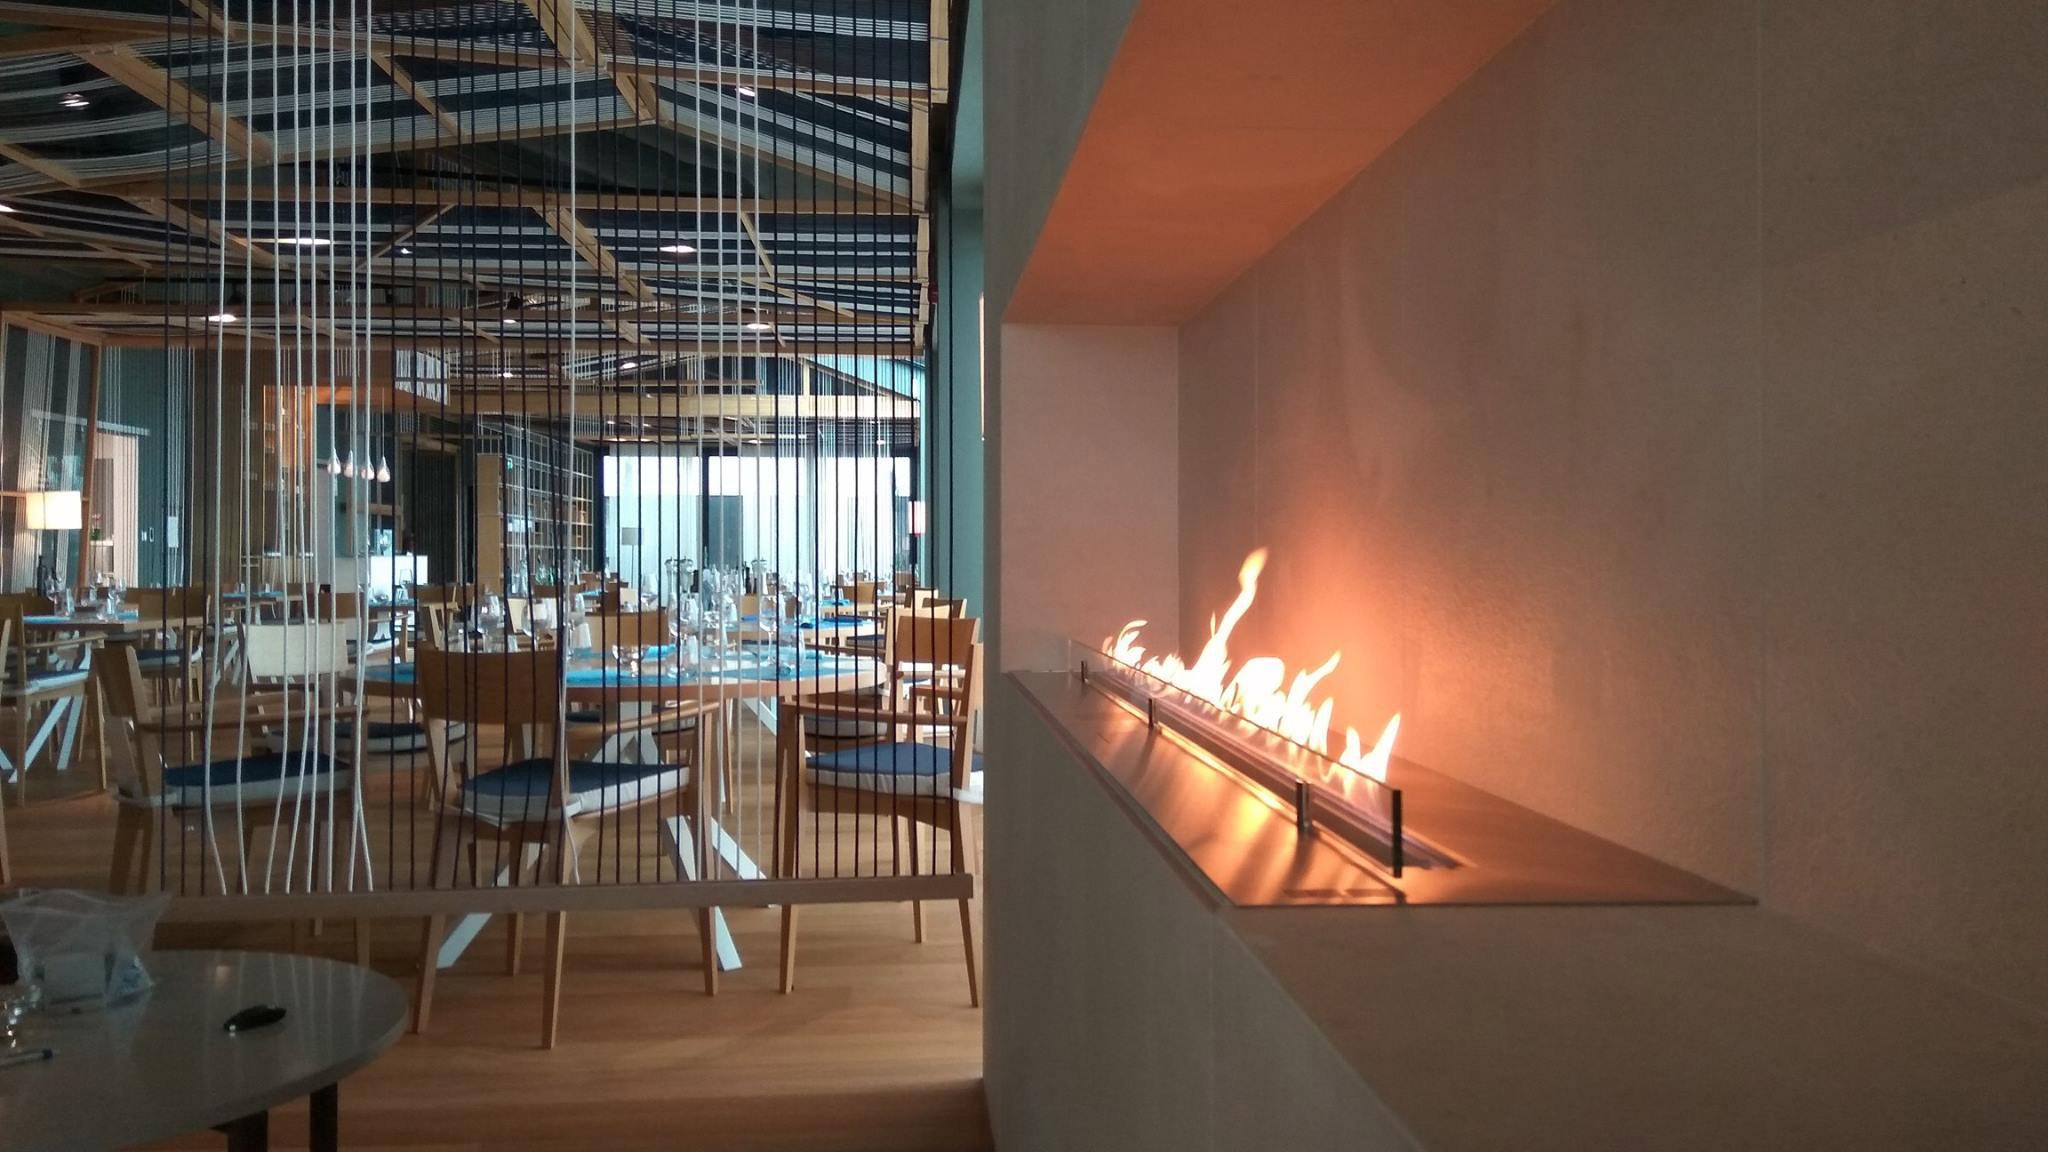 FLA3-1780mm-Sopravento-Restaurant-Aci-Marina-Pomer-Croatia-Designer-Pul-ar-croatia-Dist.-Ardeo-Plam.jpg